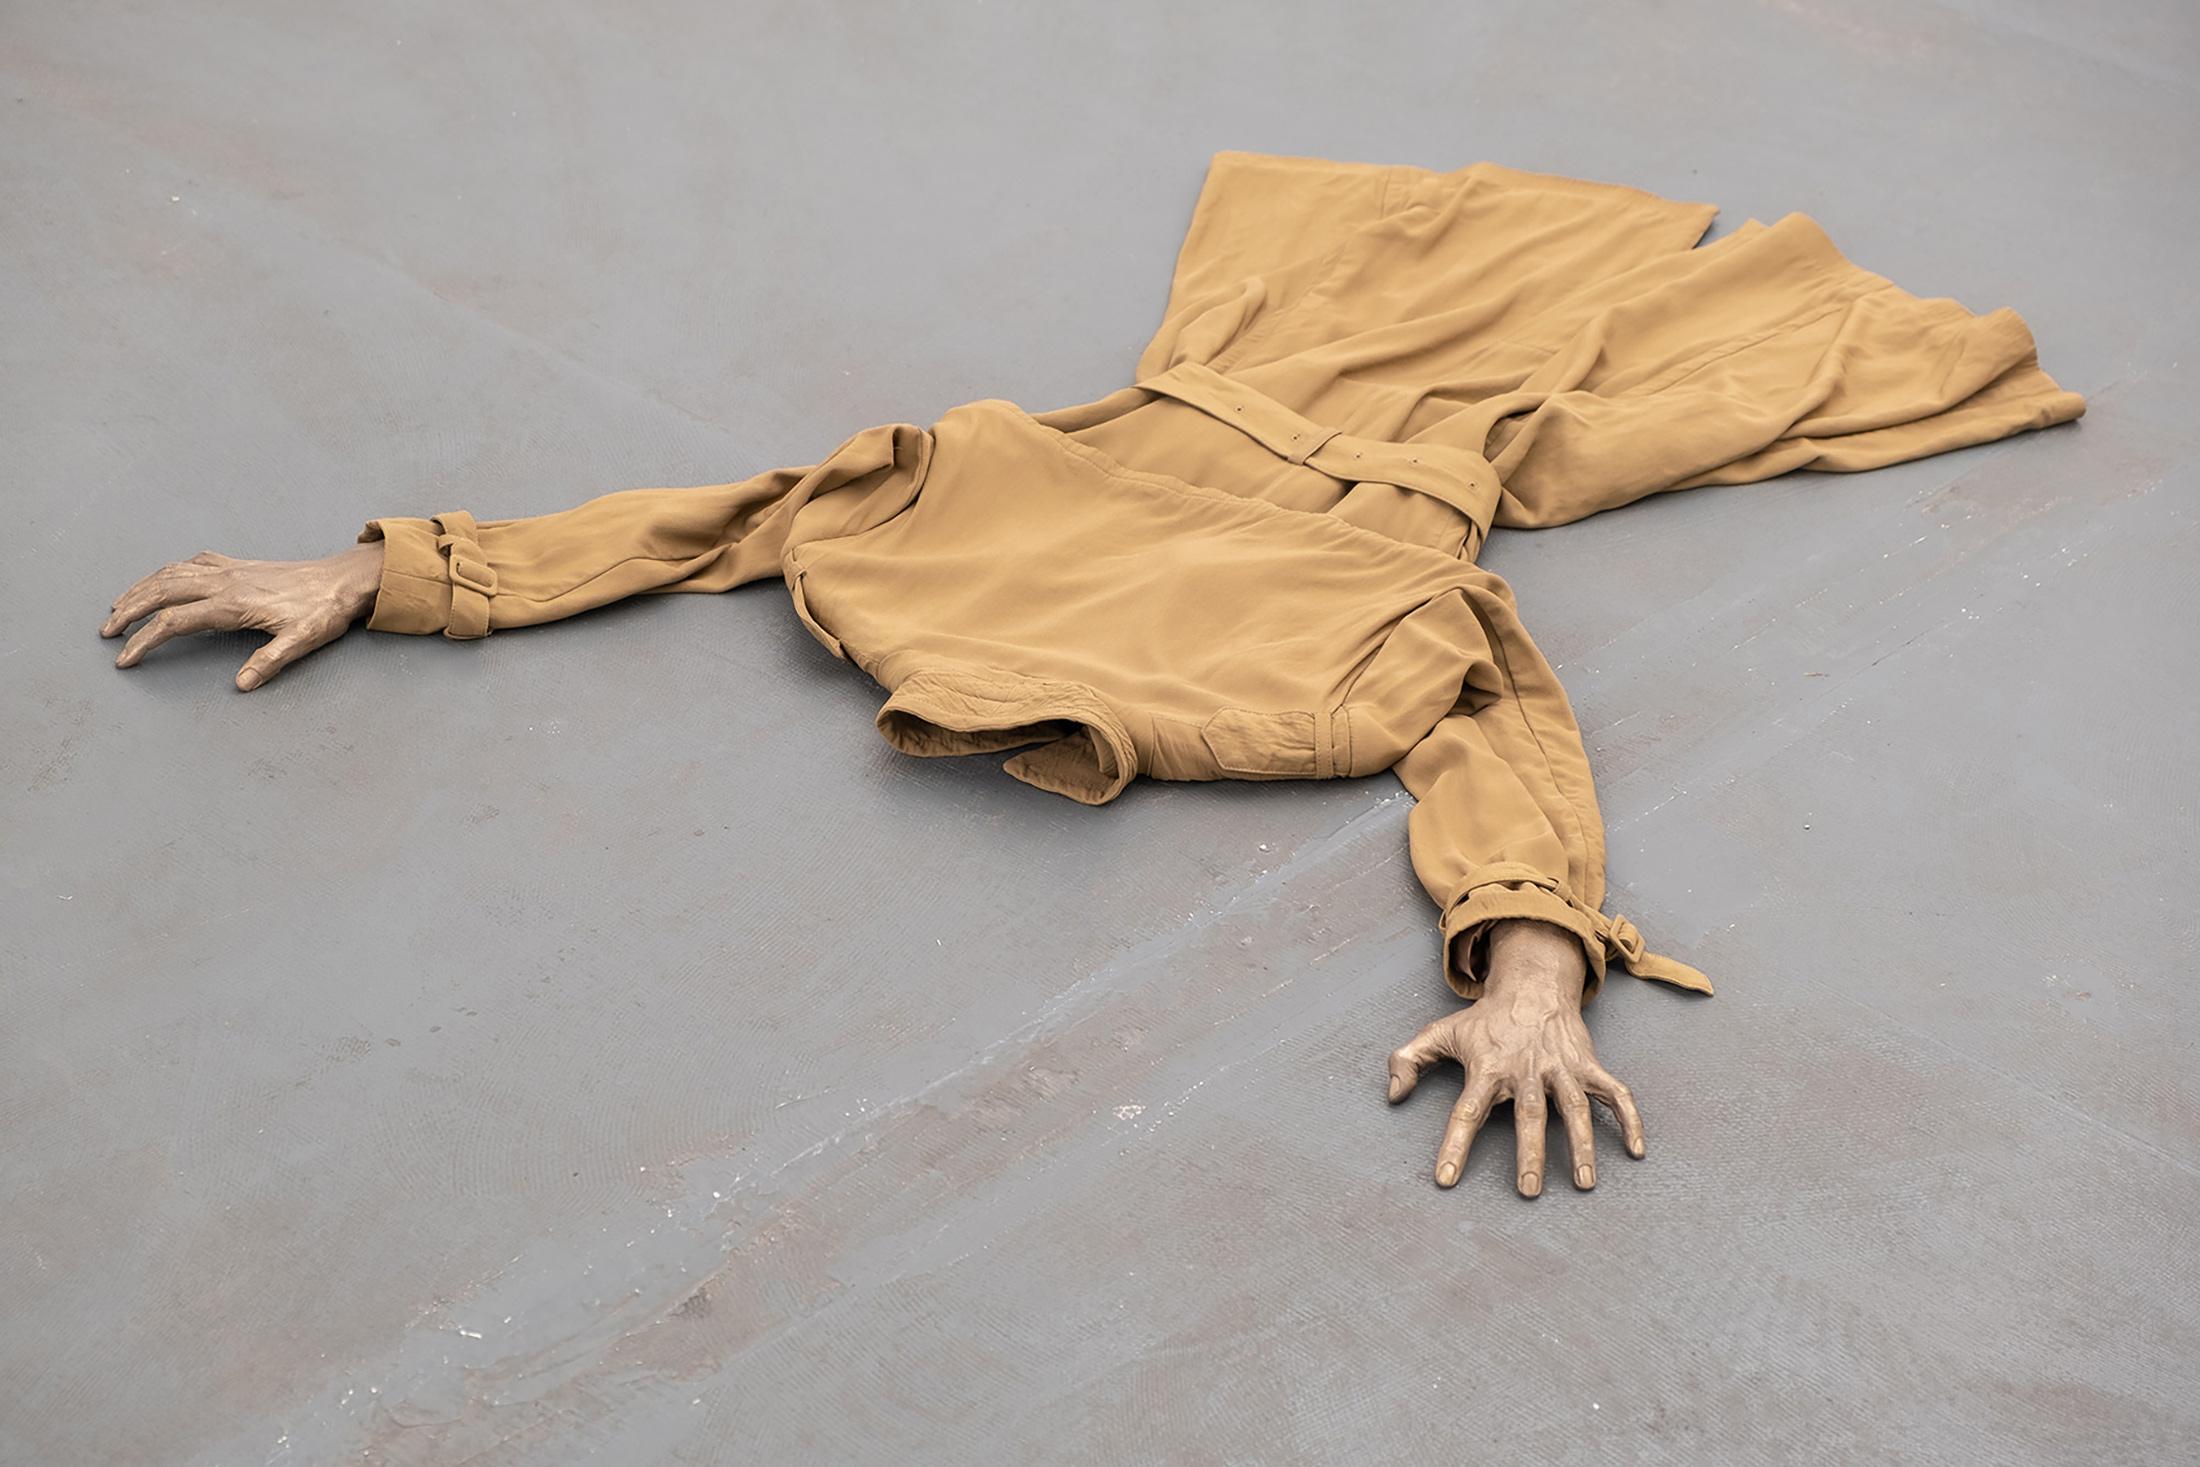 sofia goscinski, believer, unttld contemporary, exhibition, viewing room